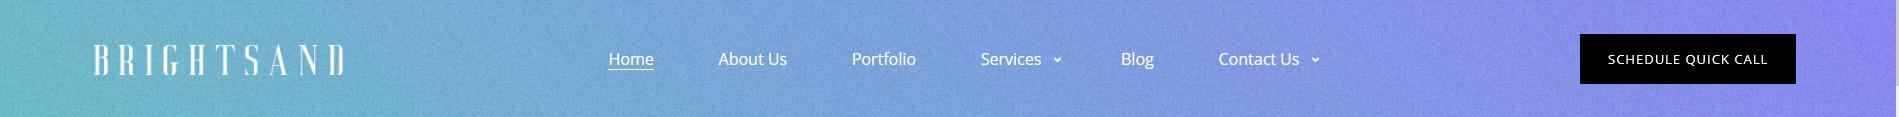 description of brightsnd designs services